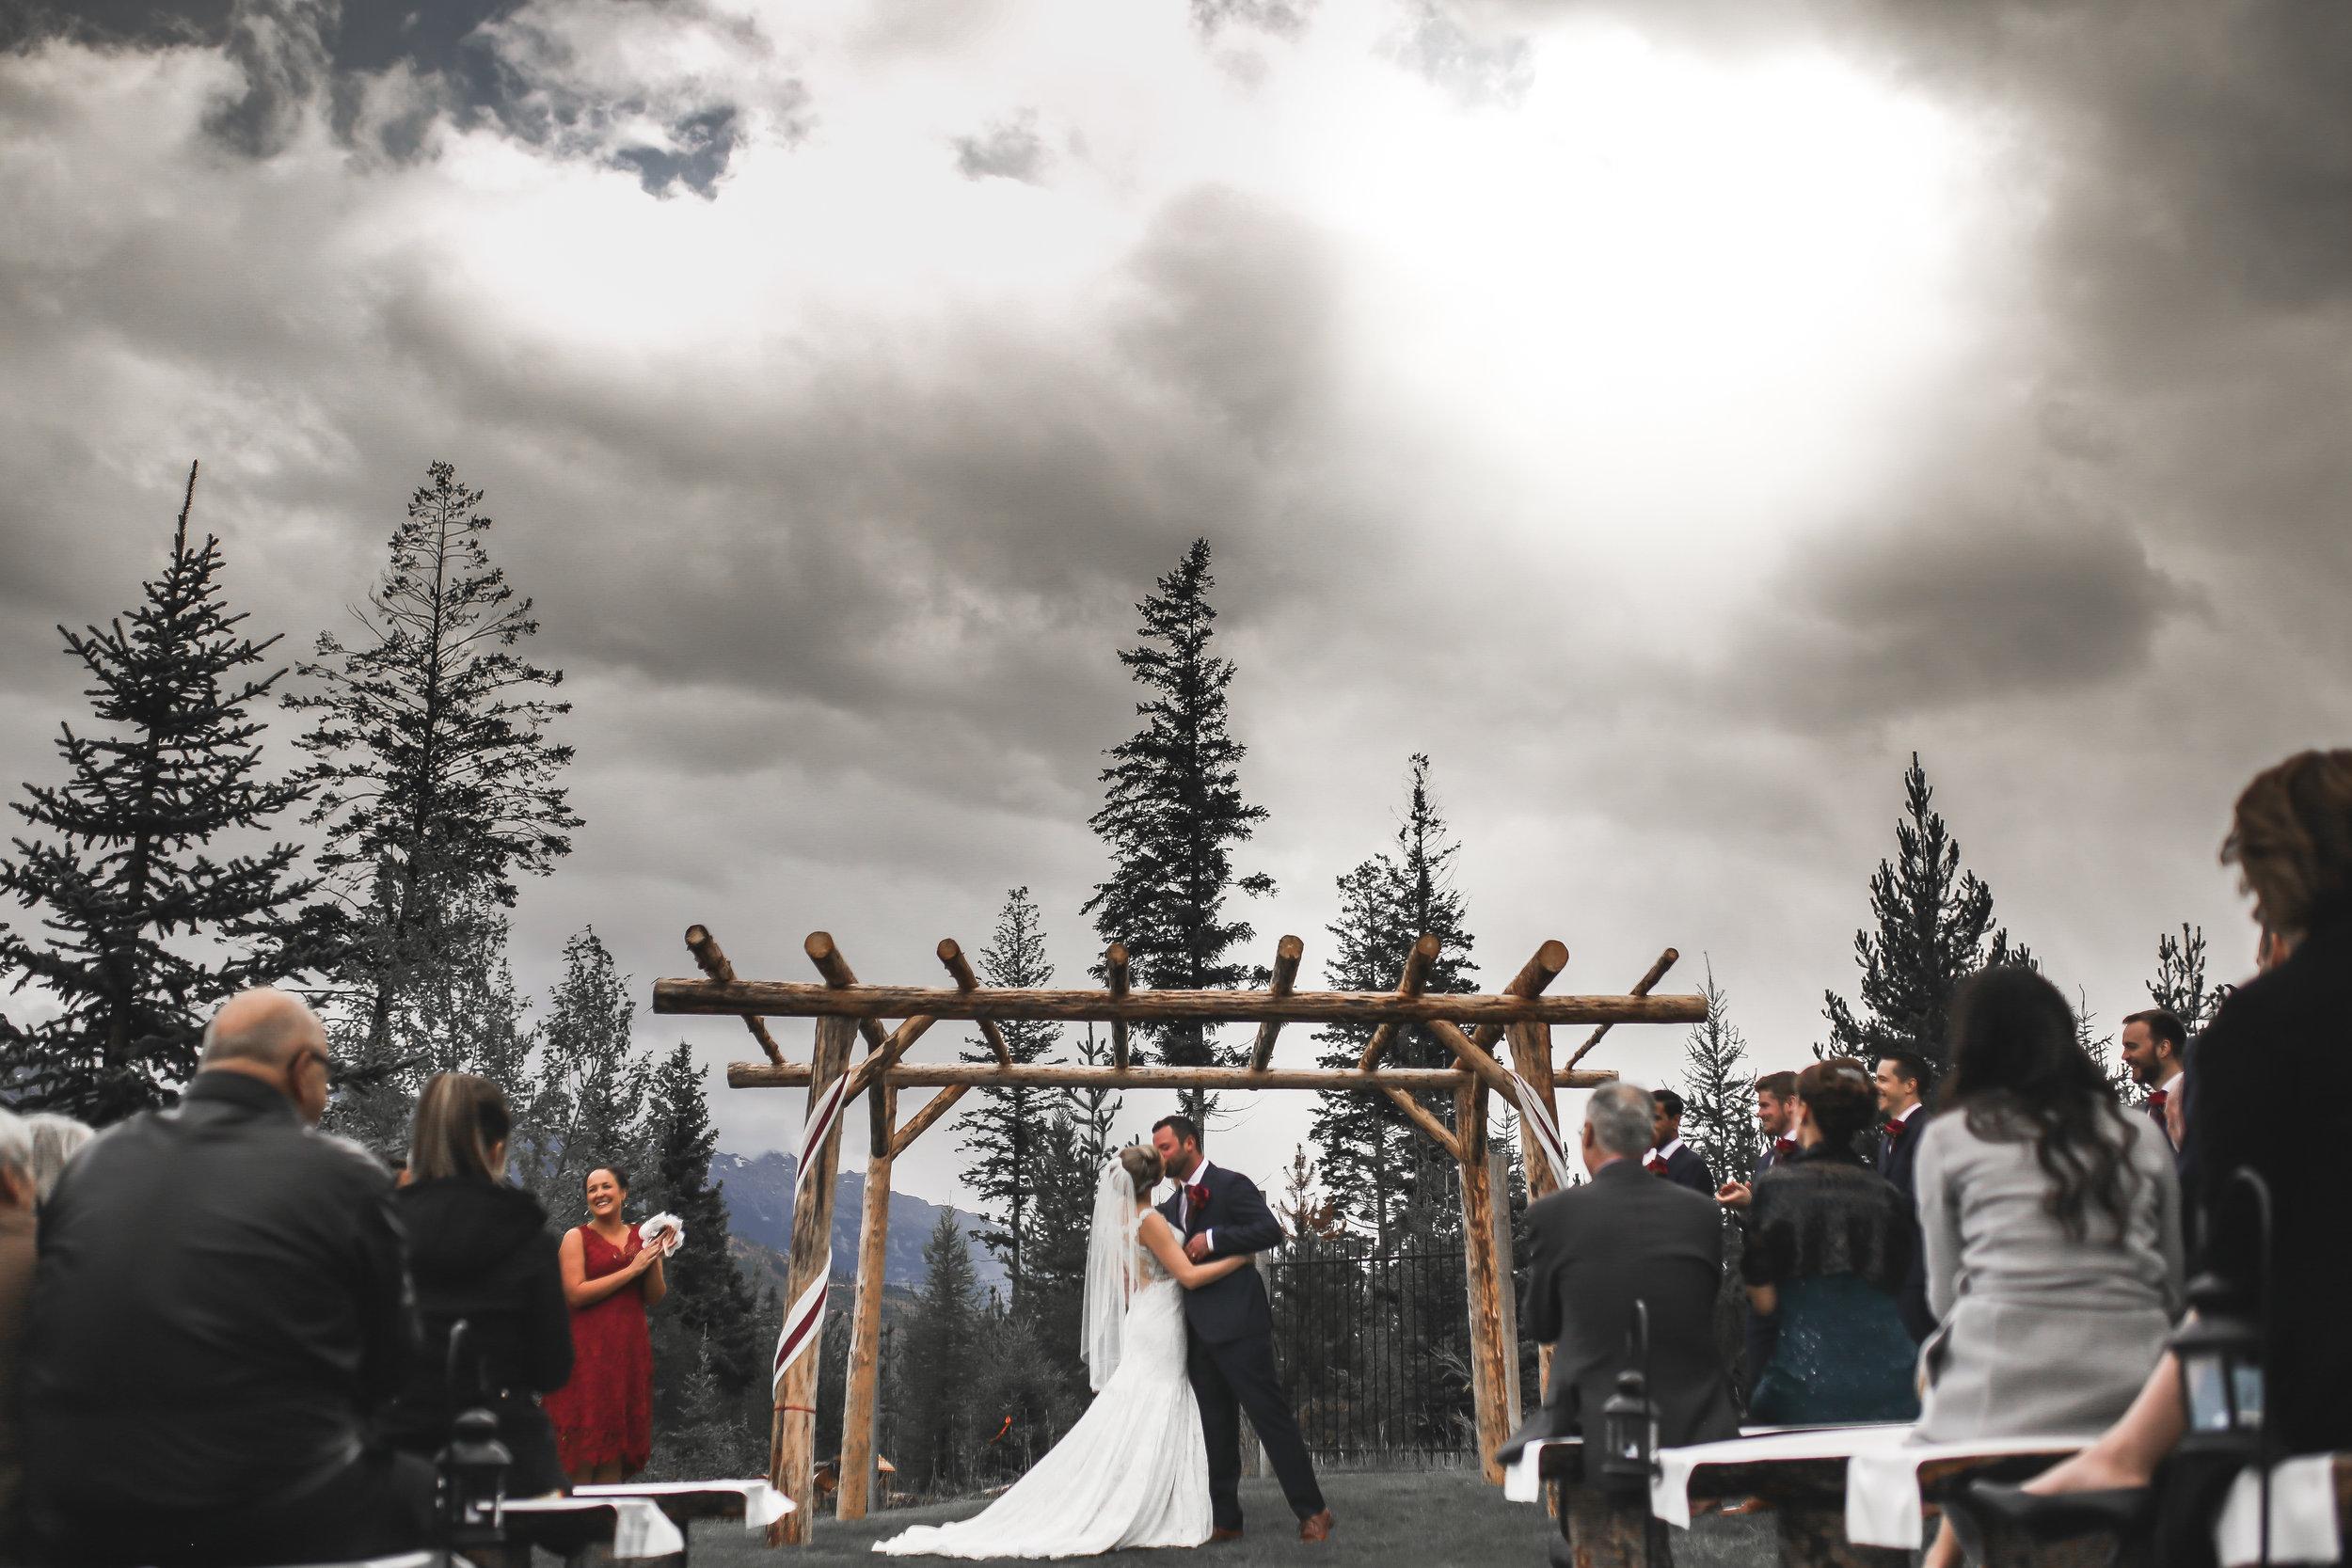 143 Adam Ziorio Photography - Vitoria wedding photographer Nick&Bree Fernie Wedding.jpg